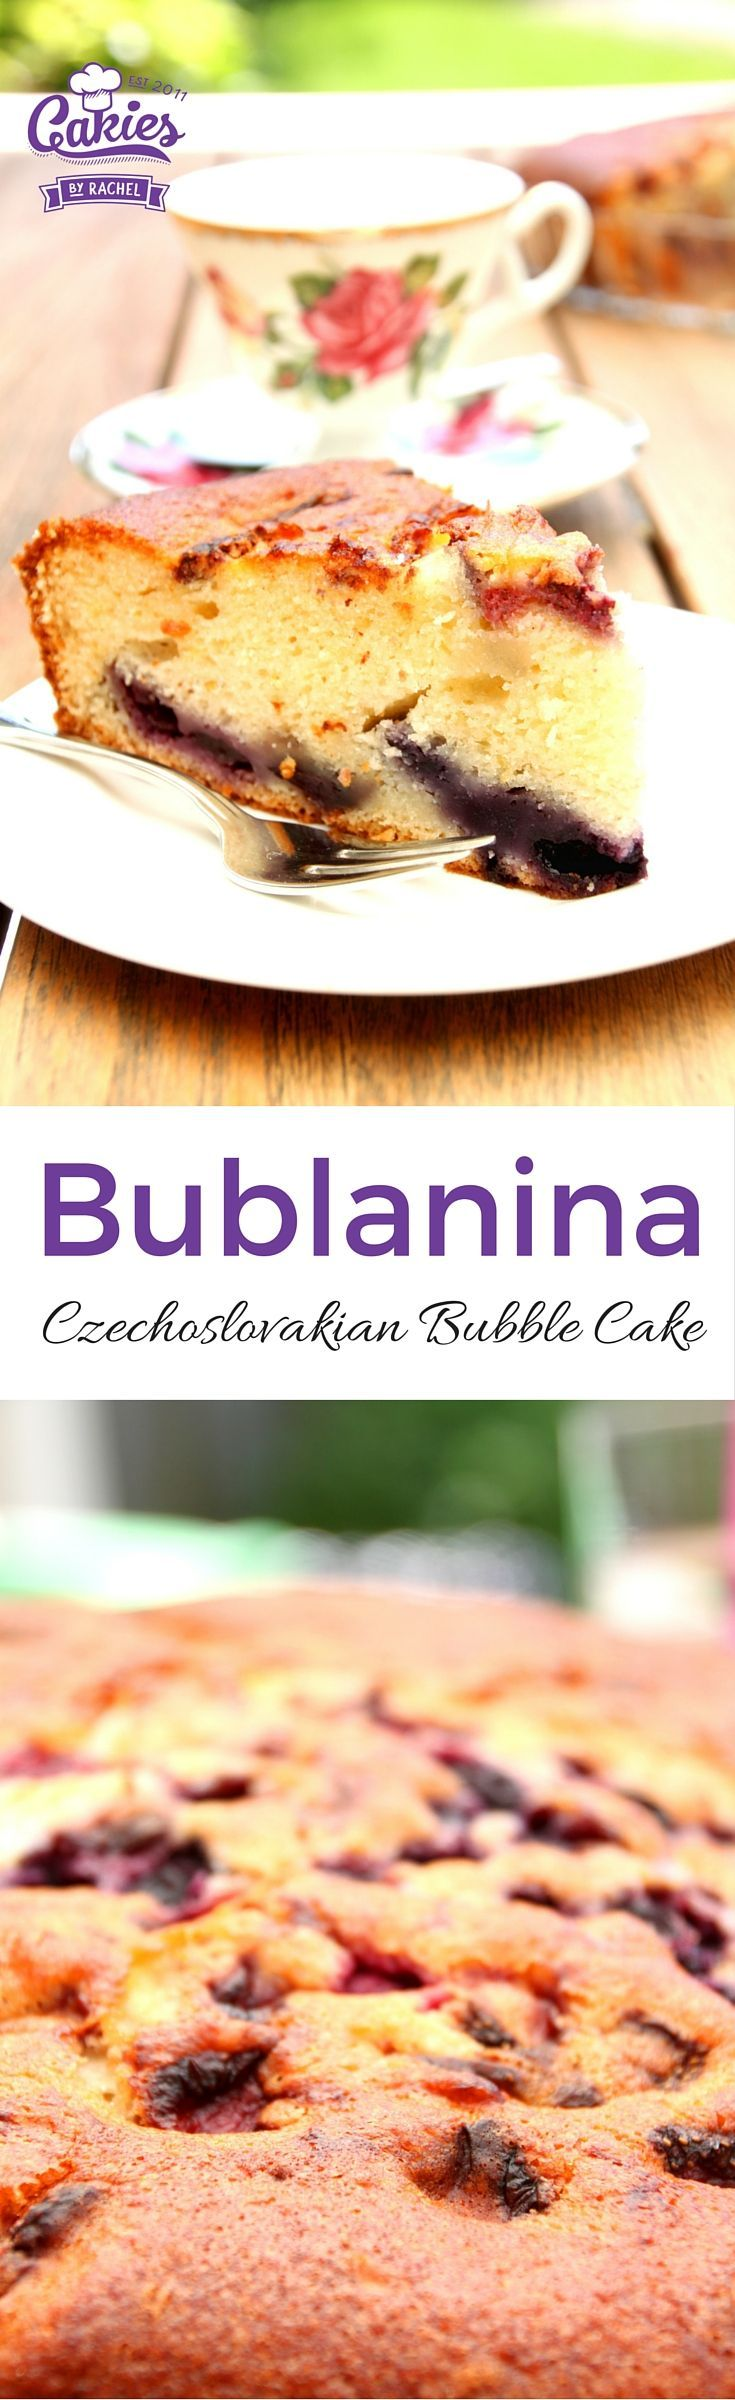 Bublanina Recipe - A Czechoslovakian Bubble Cake